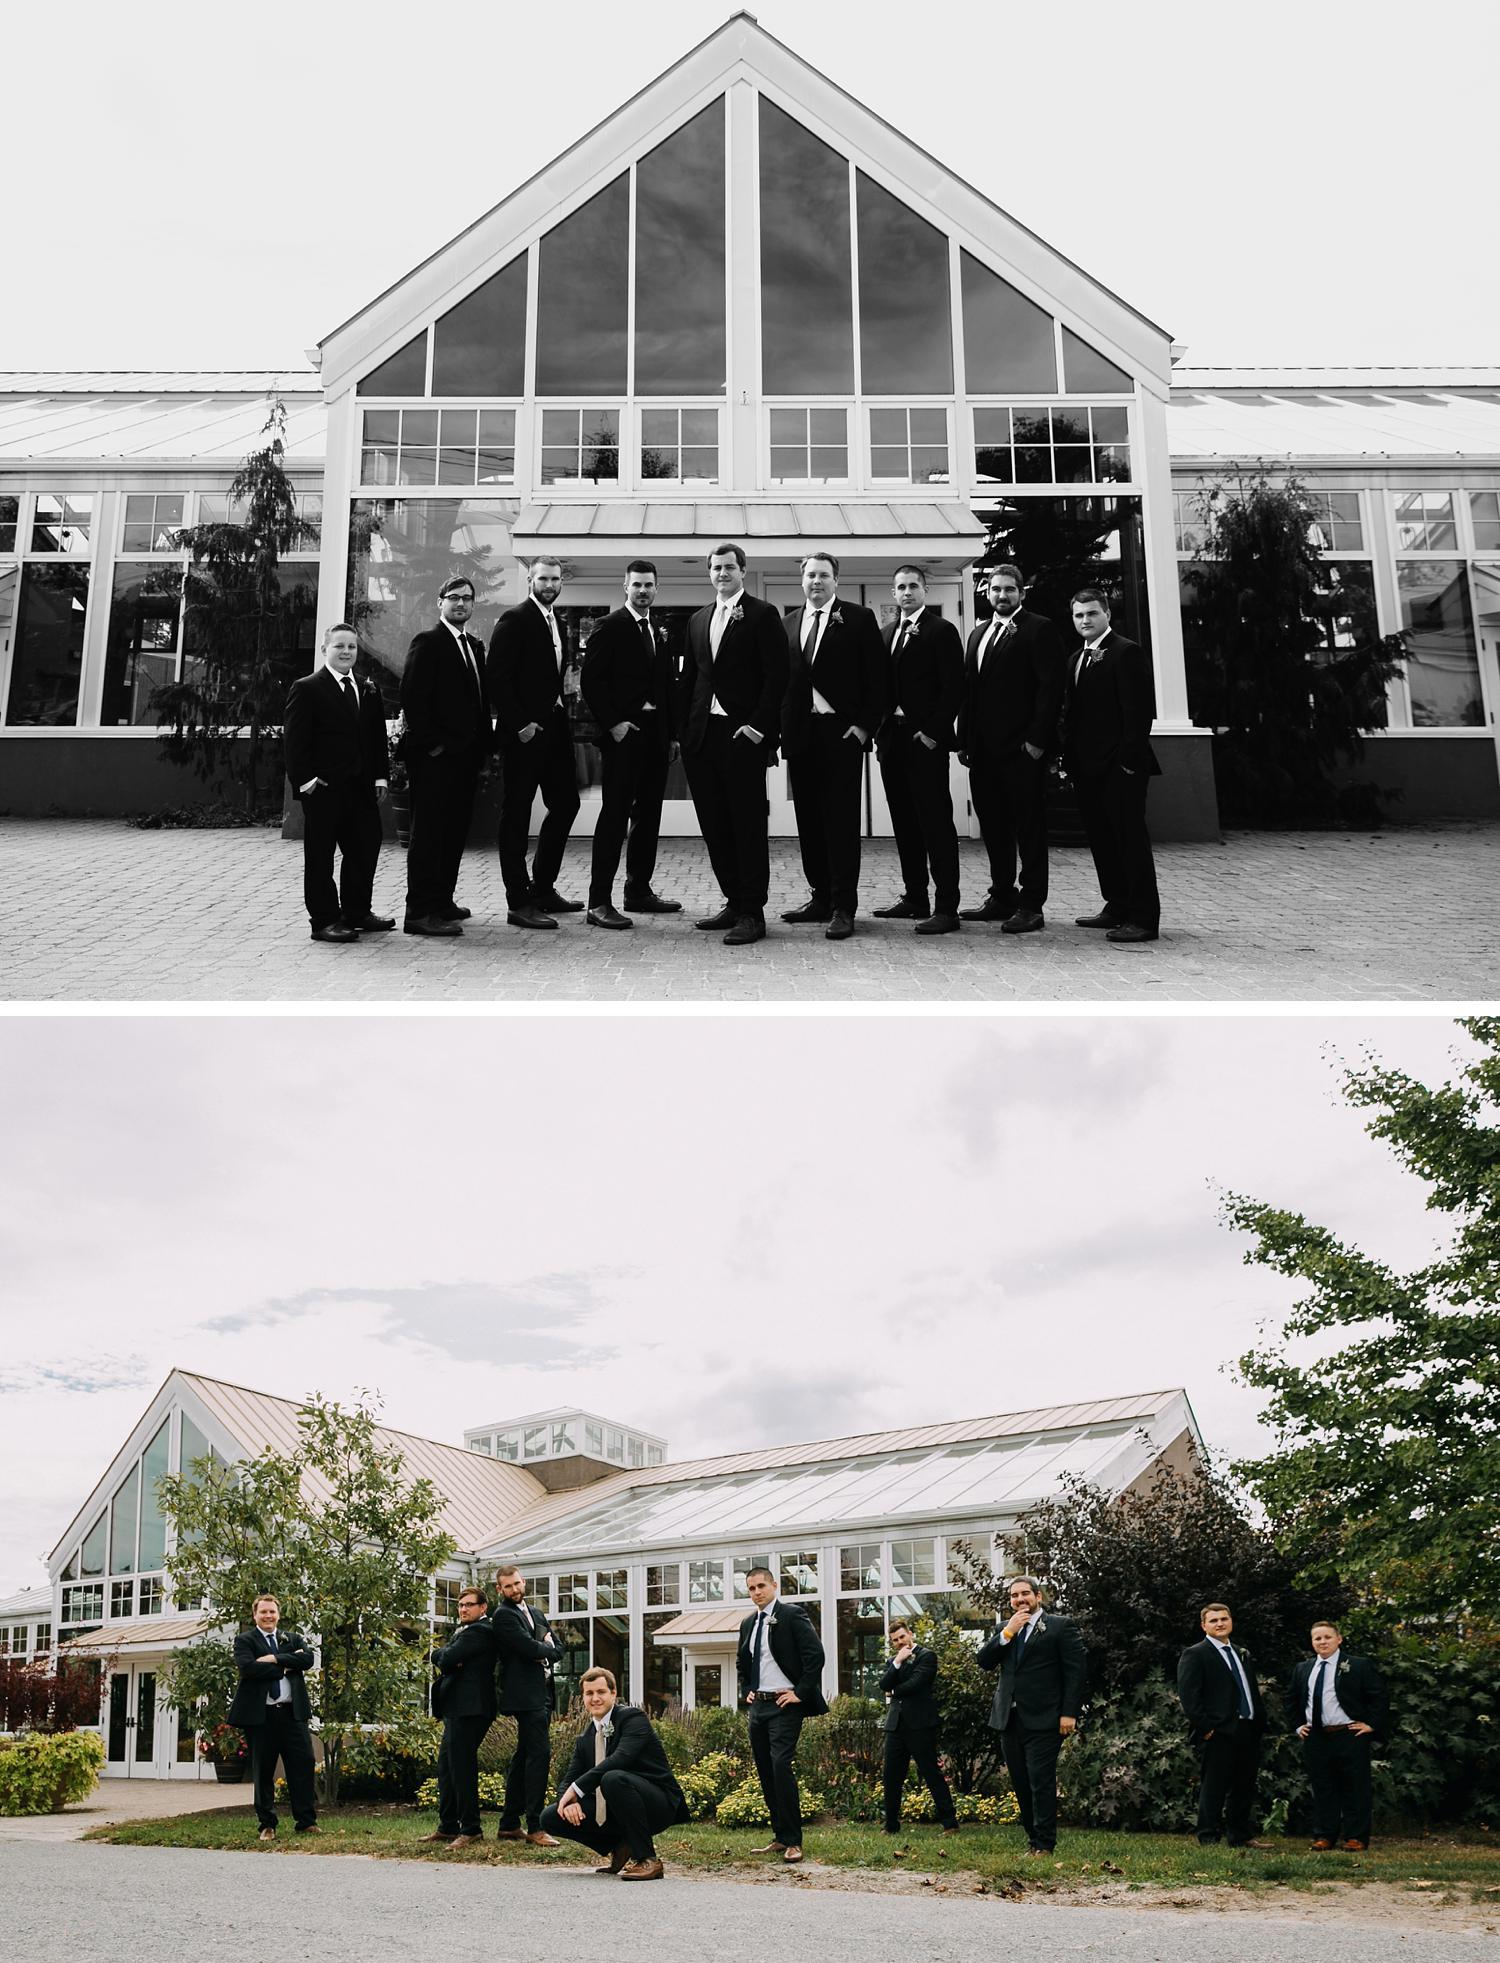 Conservatory Sussex County Fairgrounds Augusta NJ Wedding Photography Steph Massaro Groomsmen